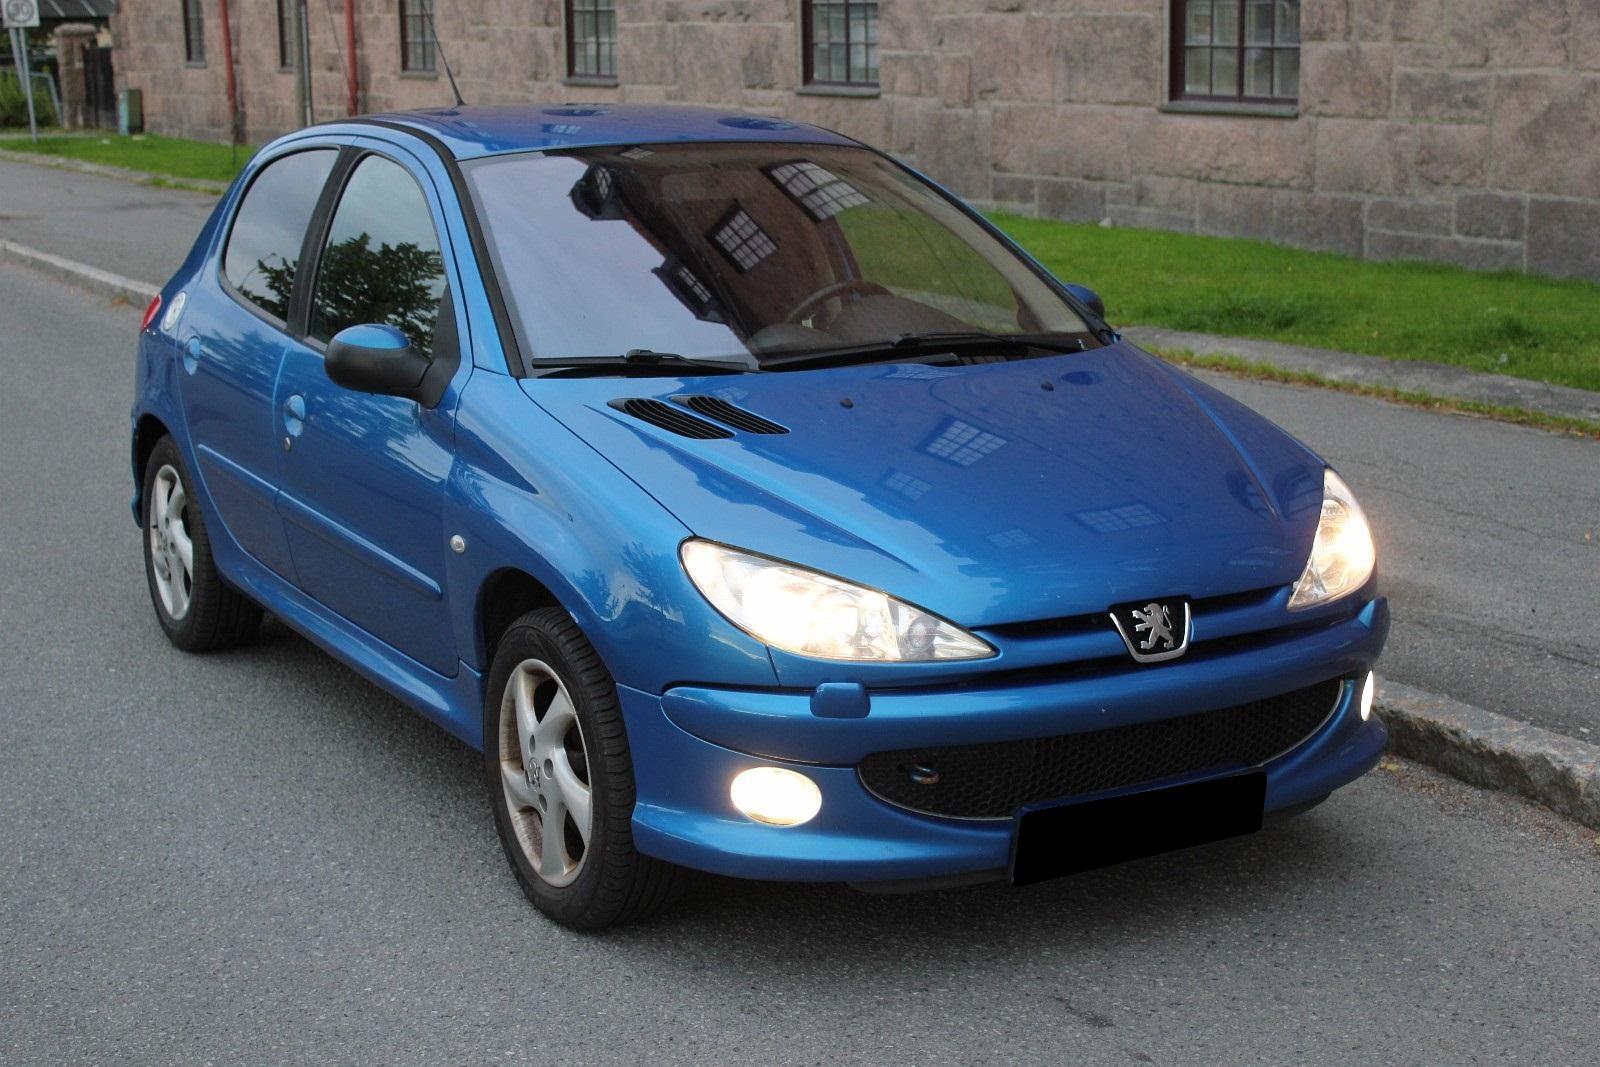 Auto occasion Peugeot 206 1.6 TDI 105CV 2008 Bleu Genève